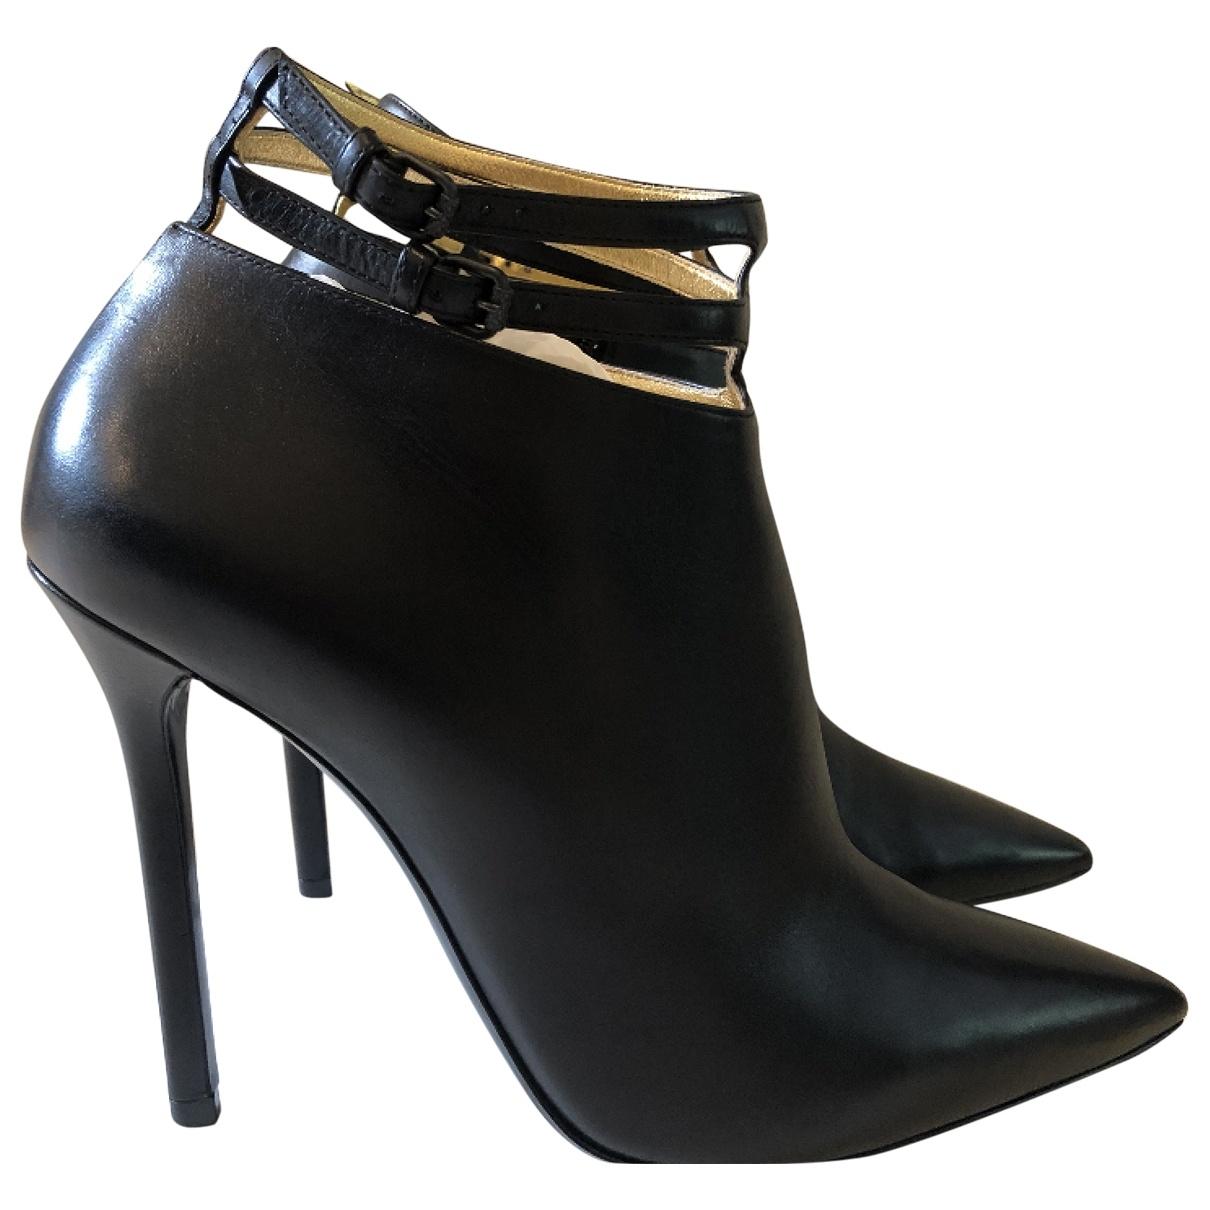 Bottega Veneta \N Black Leather Ankle boots for Women 41 EU